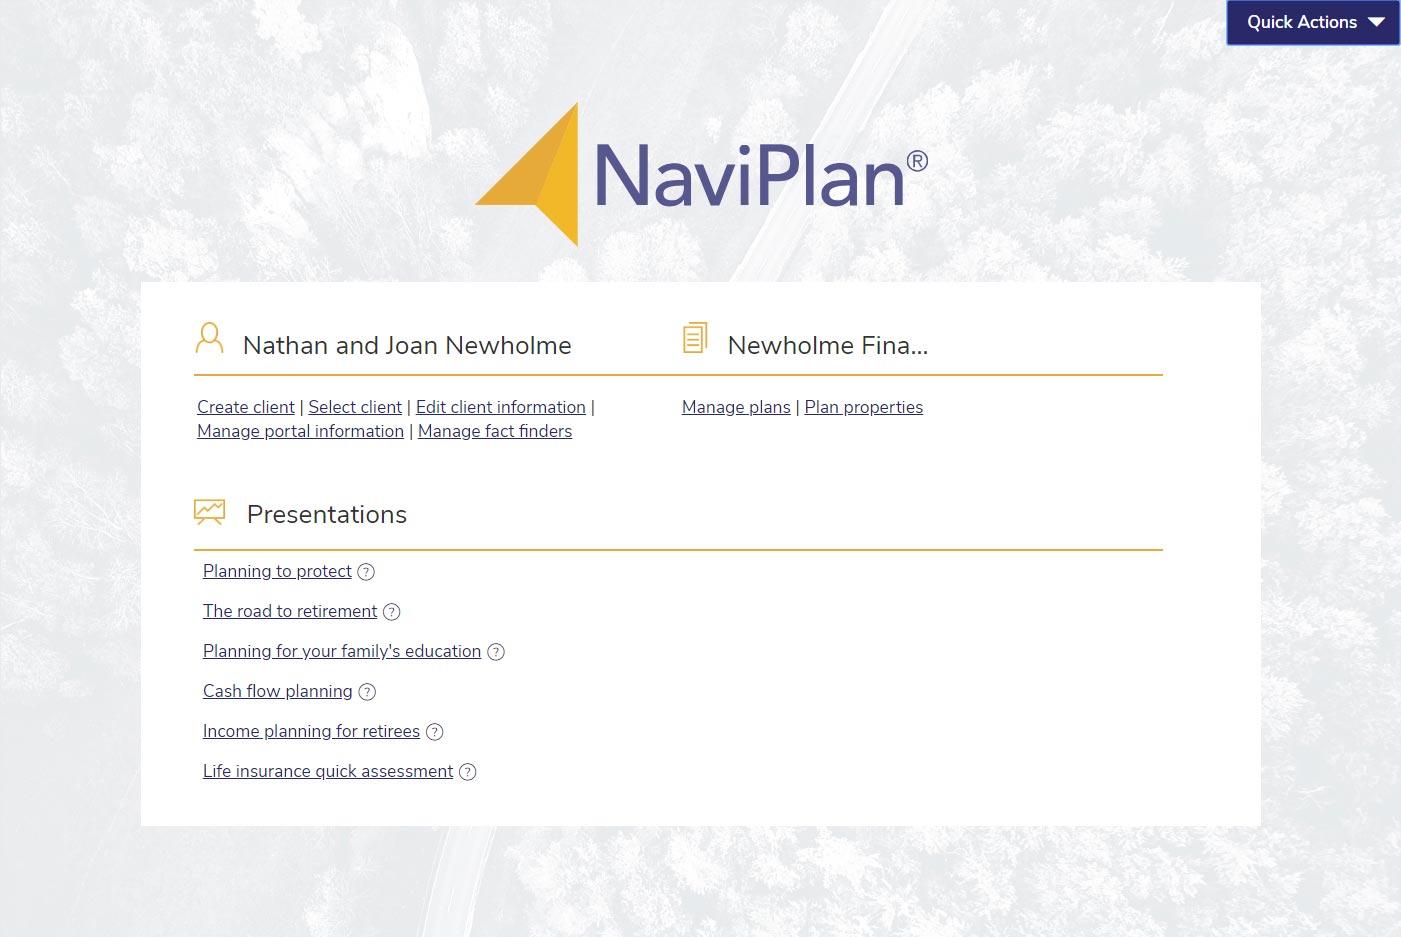 NaviPlan Presentation Module home screen